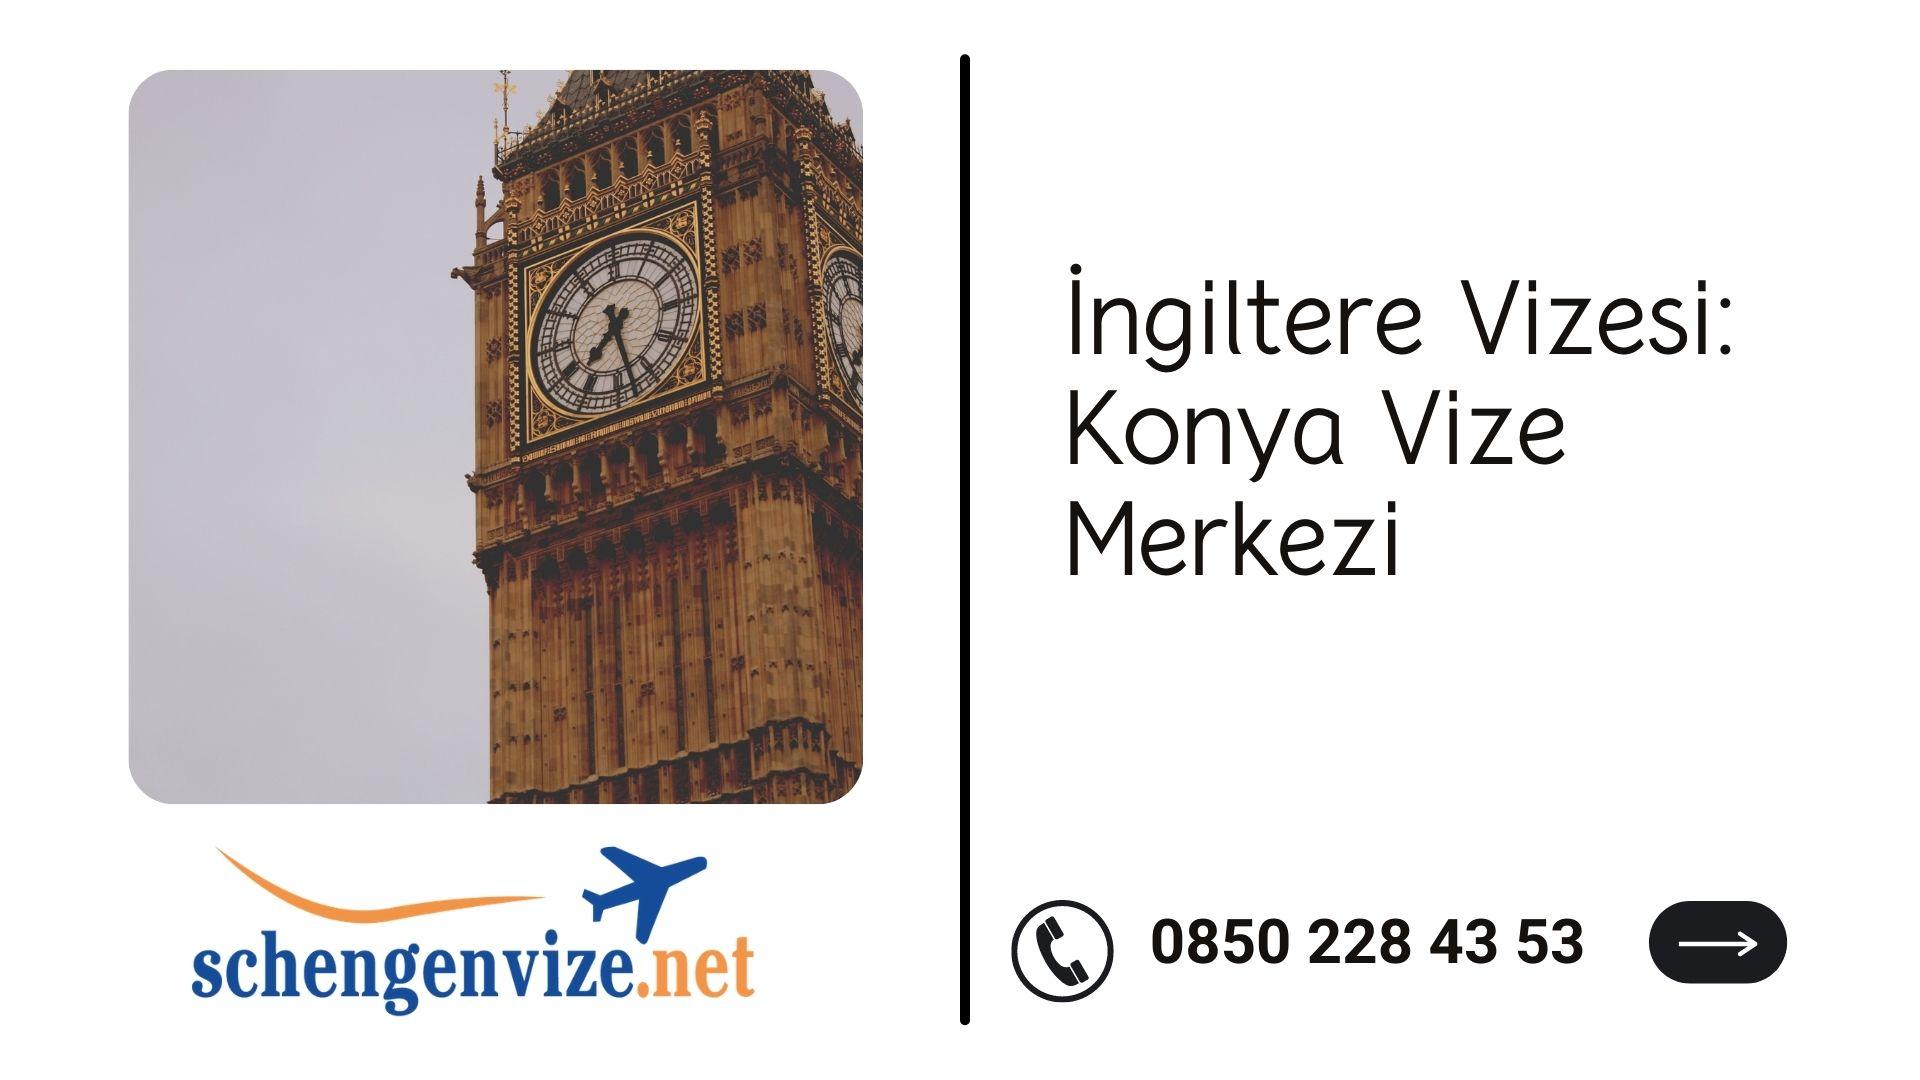 İngiltere Vizesi: Konya Vize Merkezi